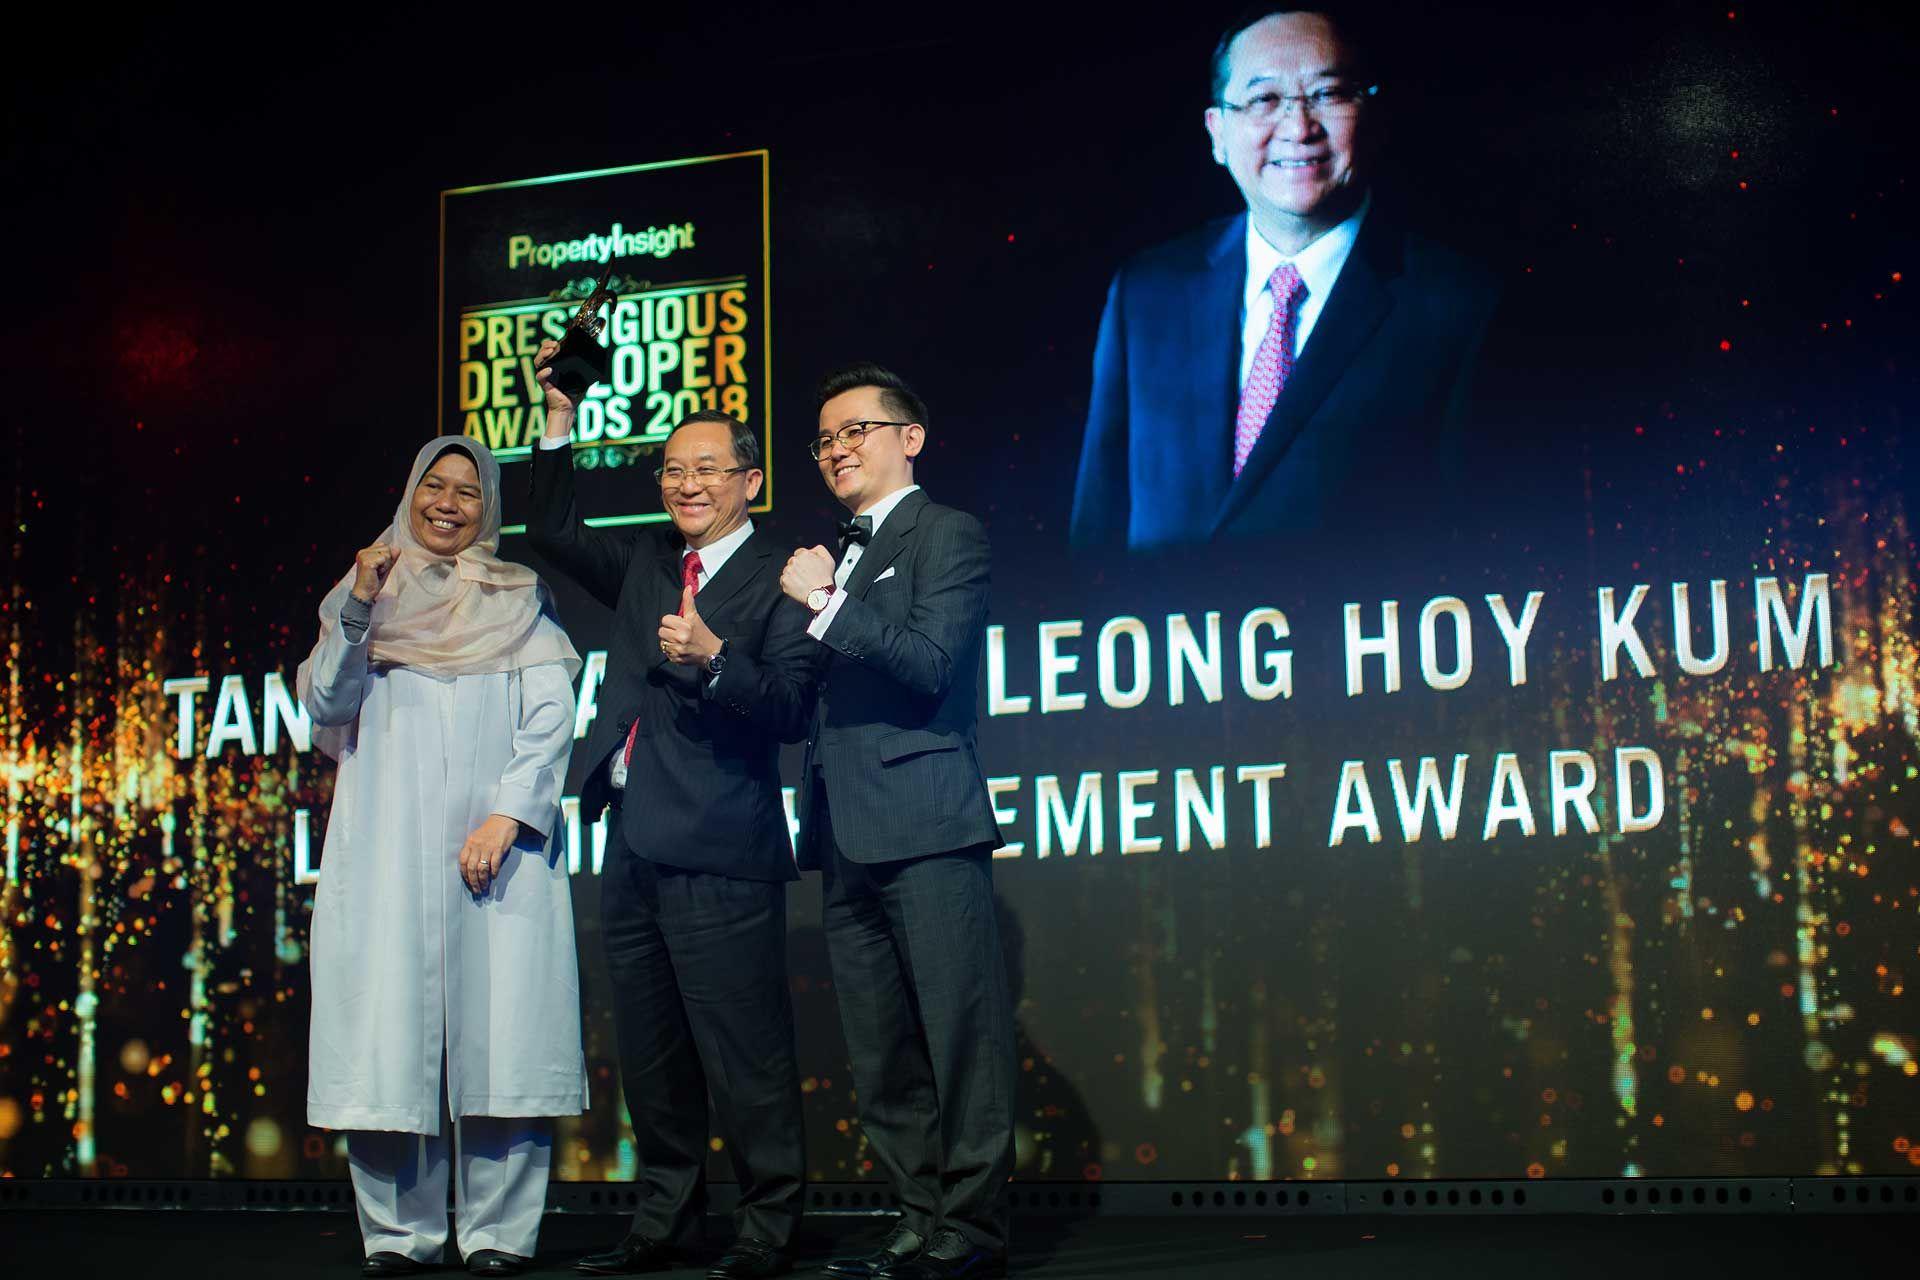 Zuraida Kamaruddin, Tan Sri Leong Hoy Kum and Dato' KK Chua